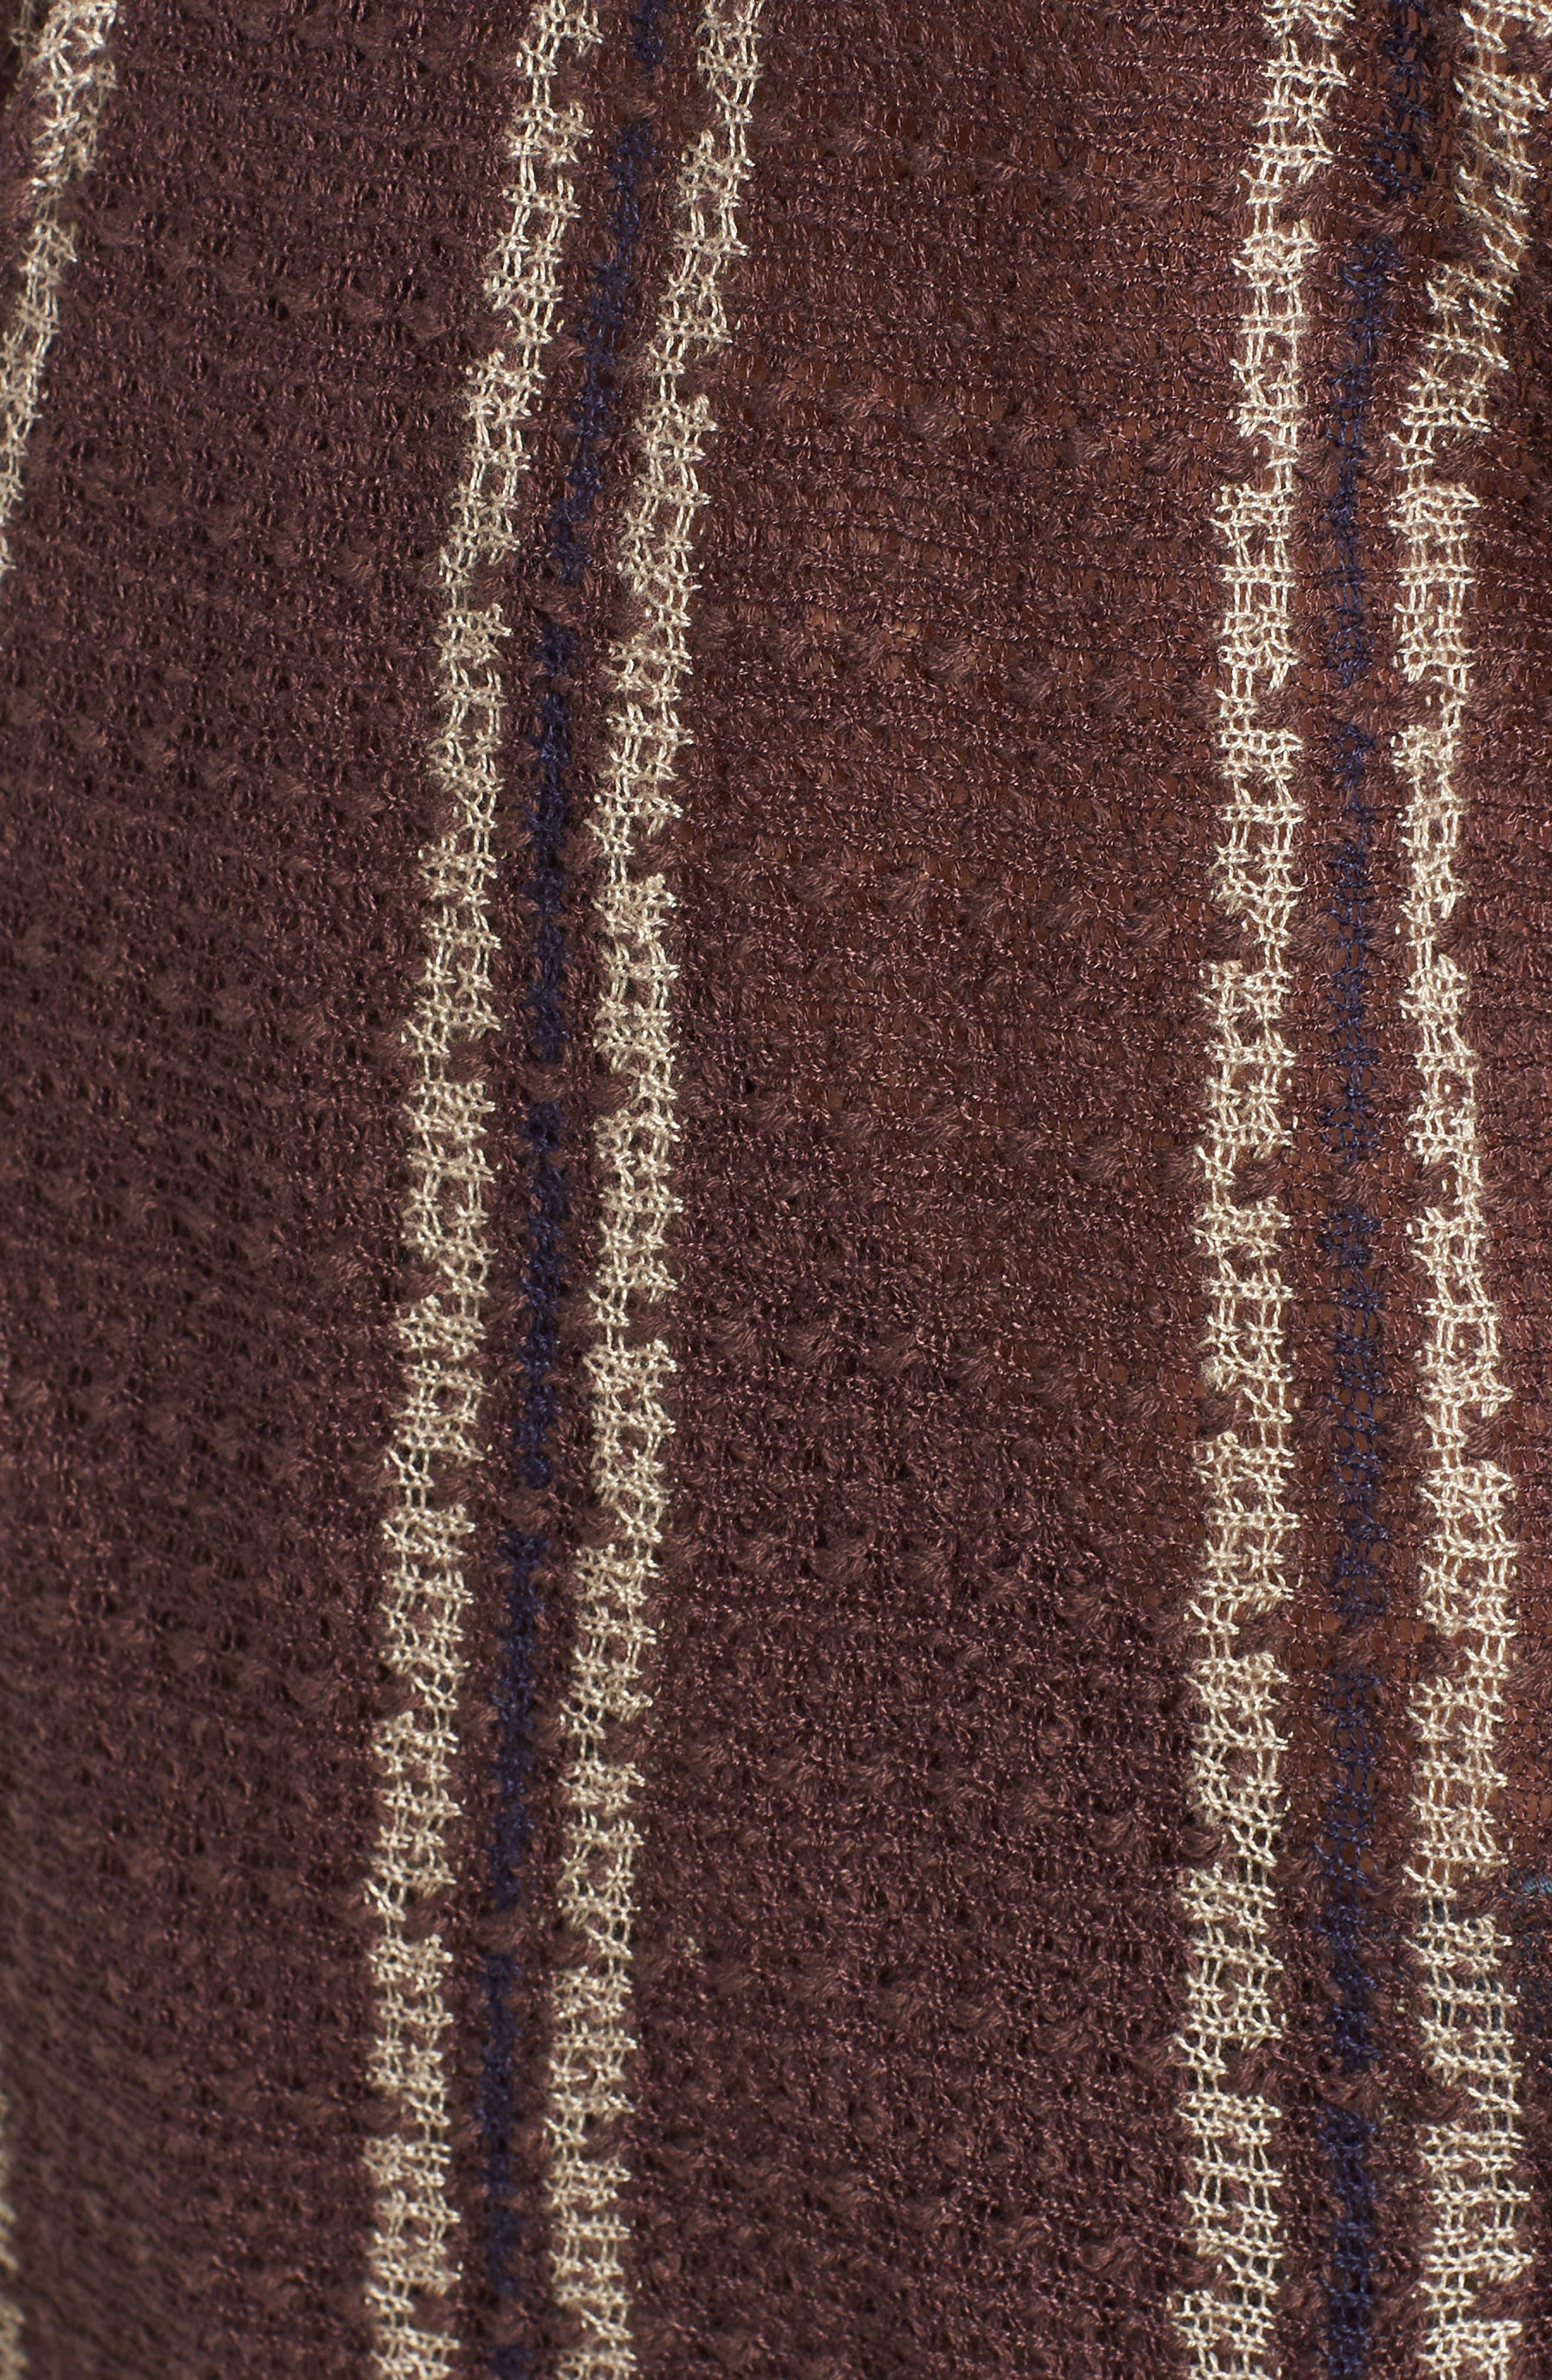 Sims Stripe Sweater,                             Alternate thumbnail 11, color,